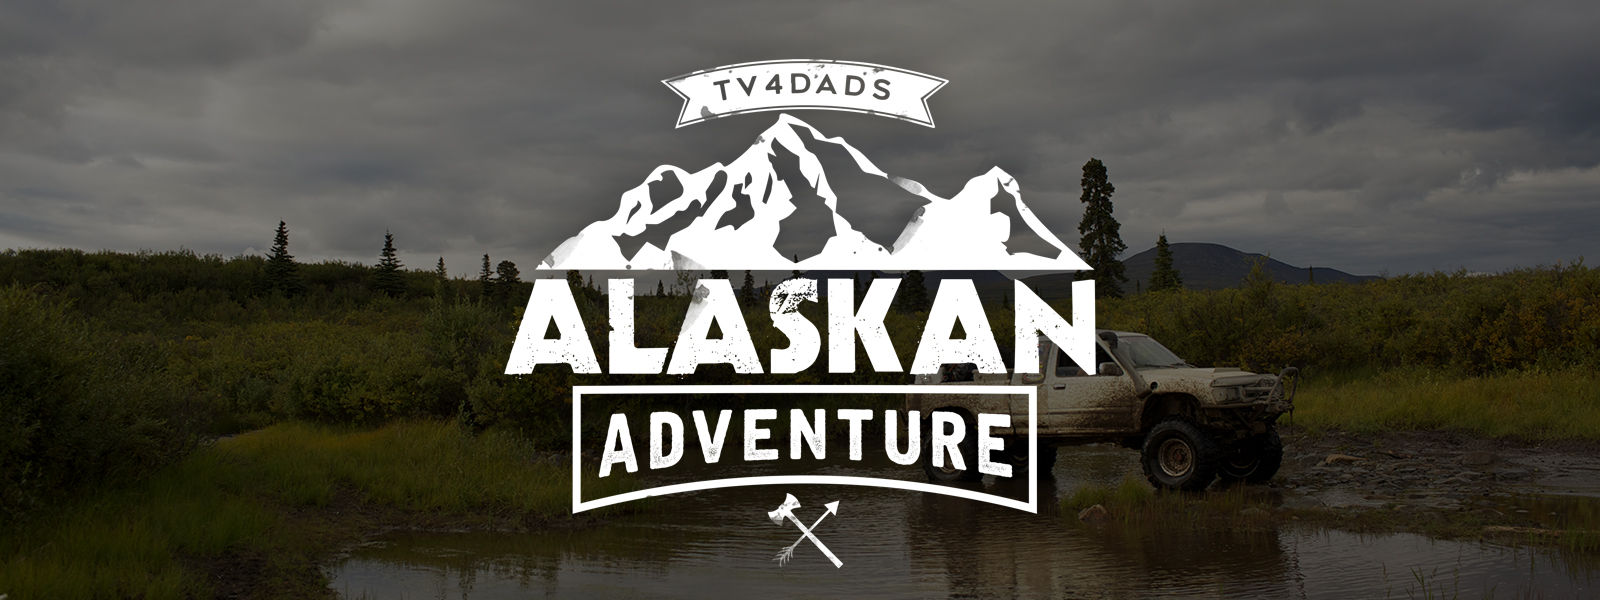 TV4DADS: Alaskan Adventure